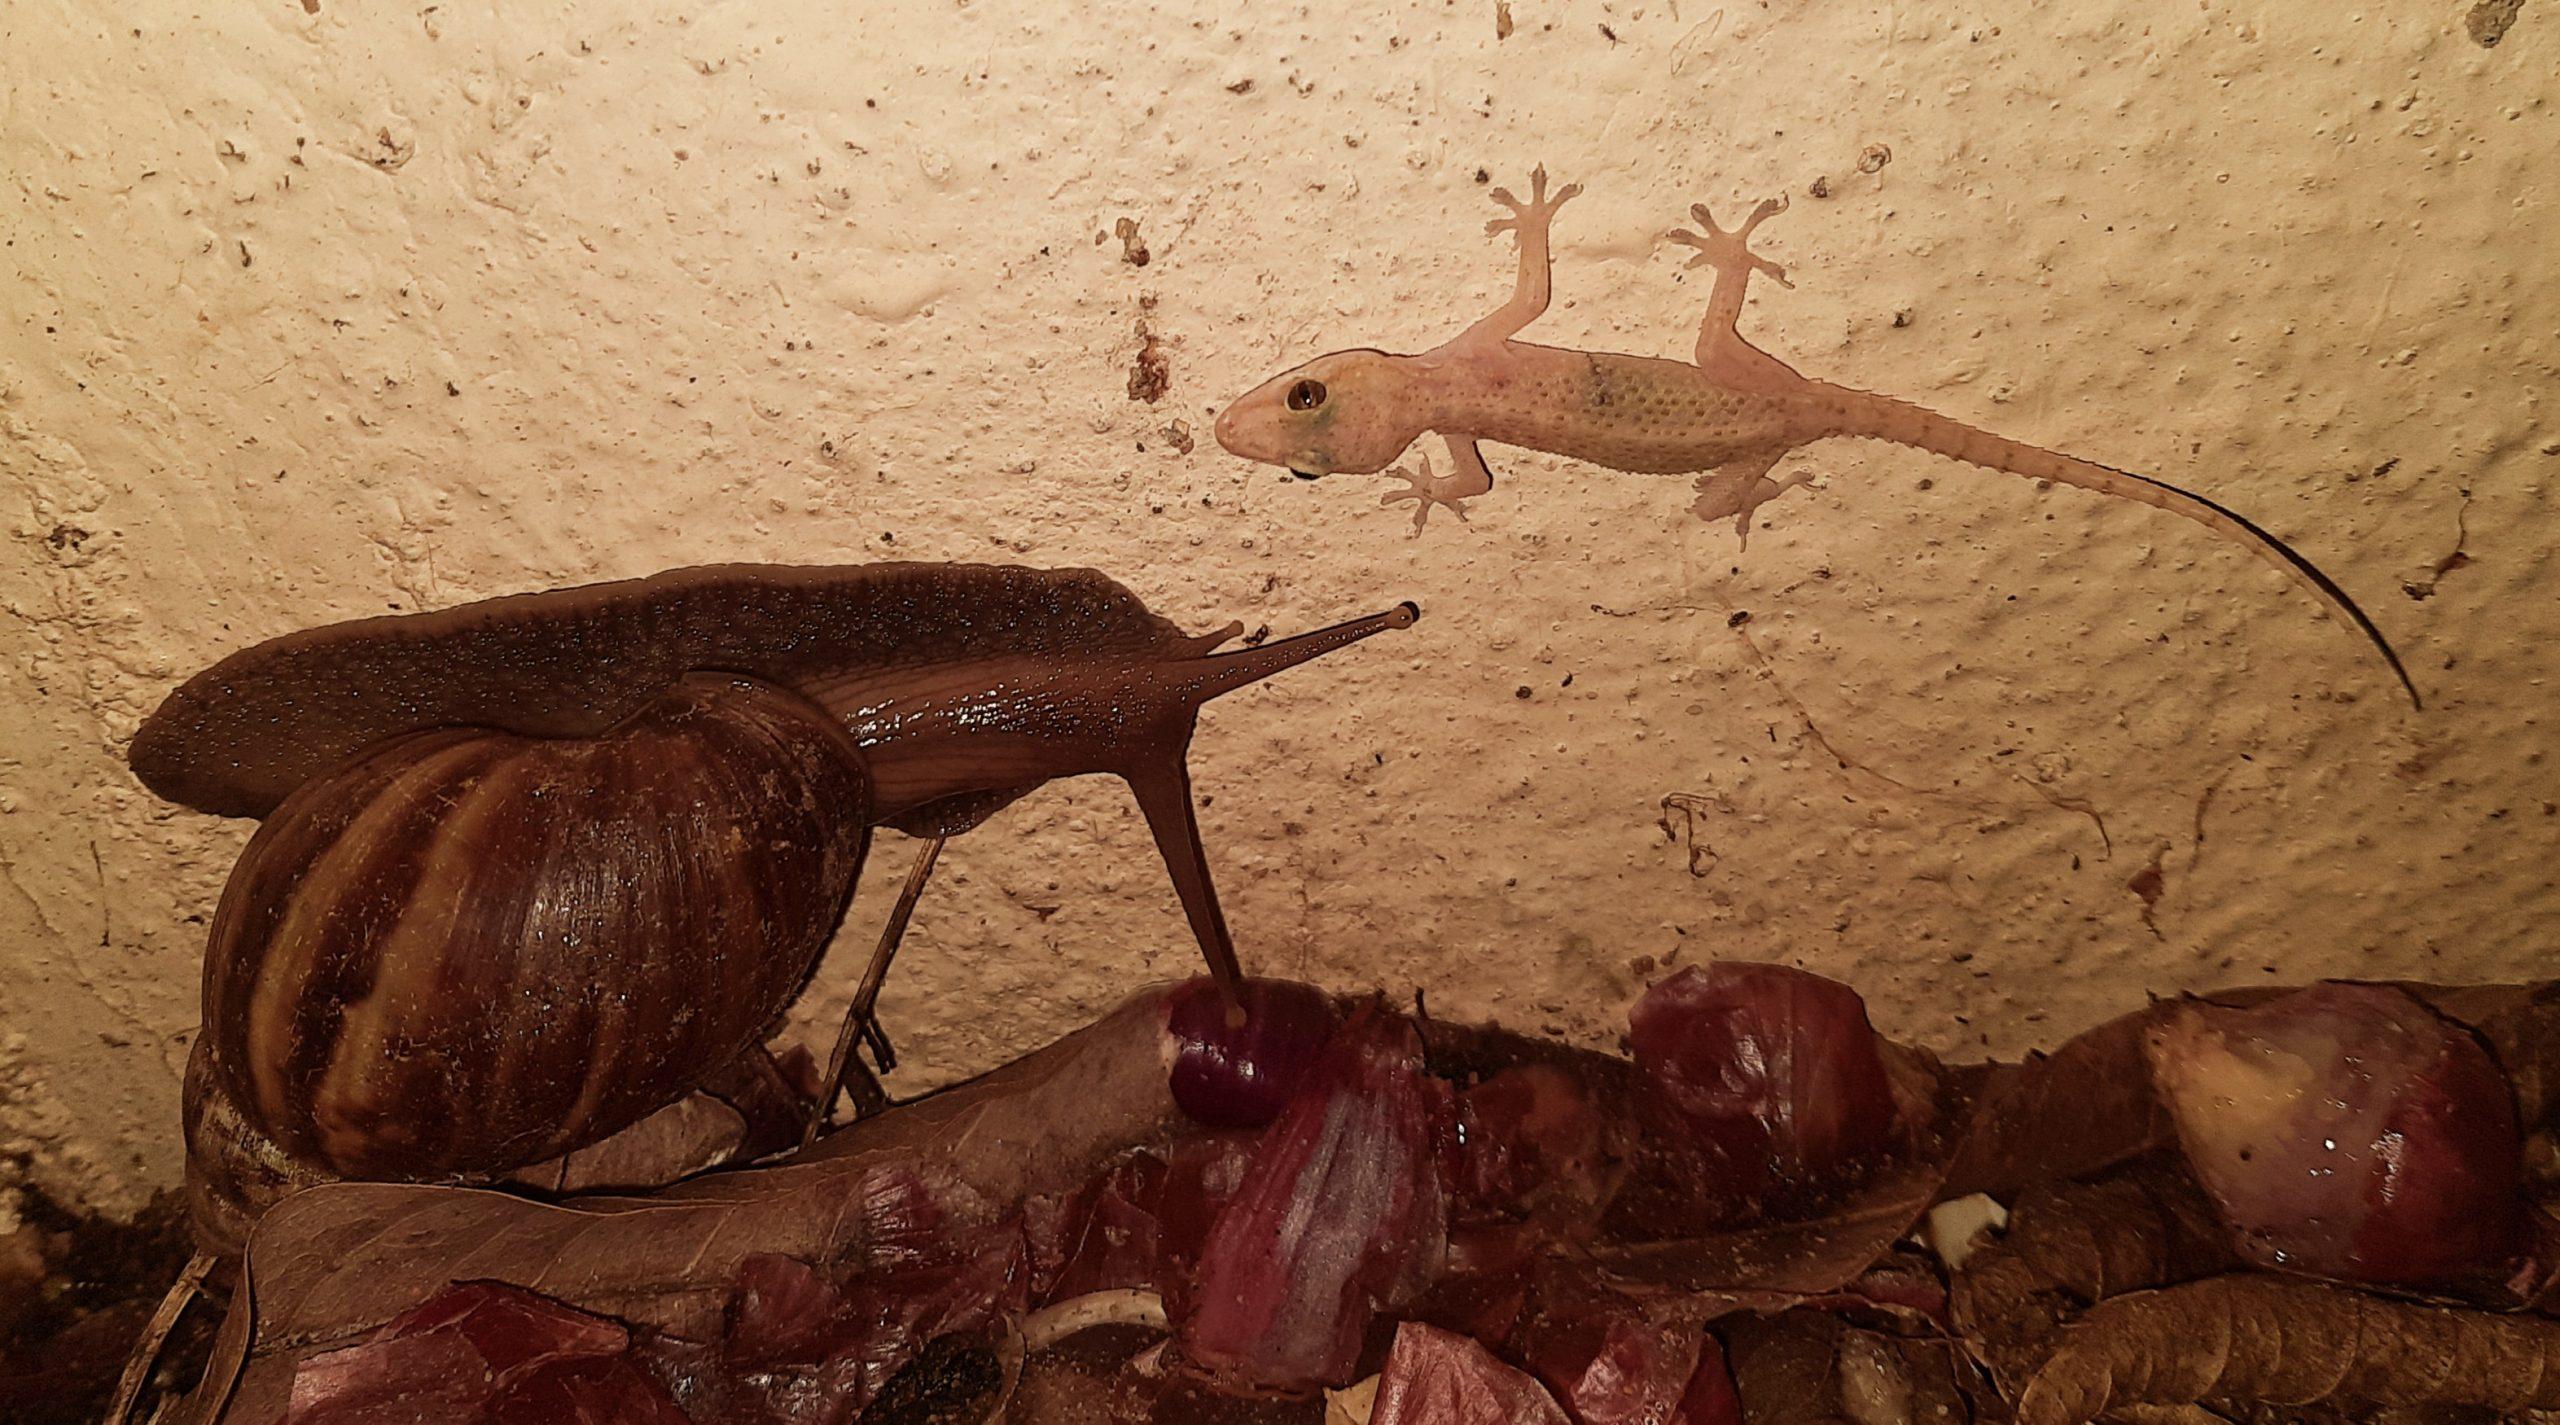 A Snail and lizard